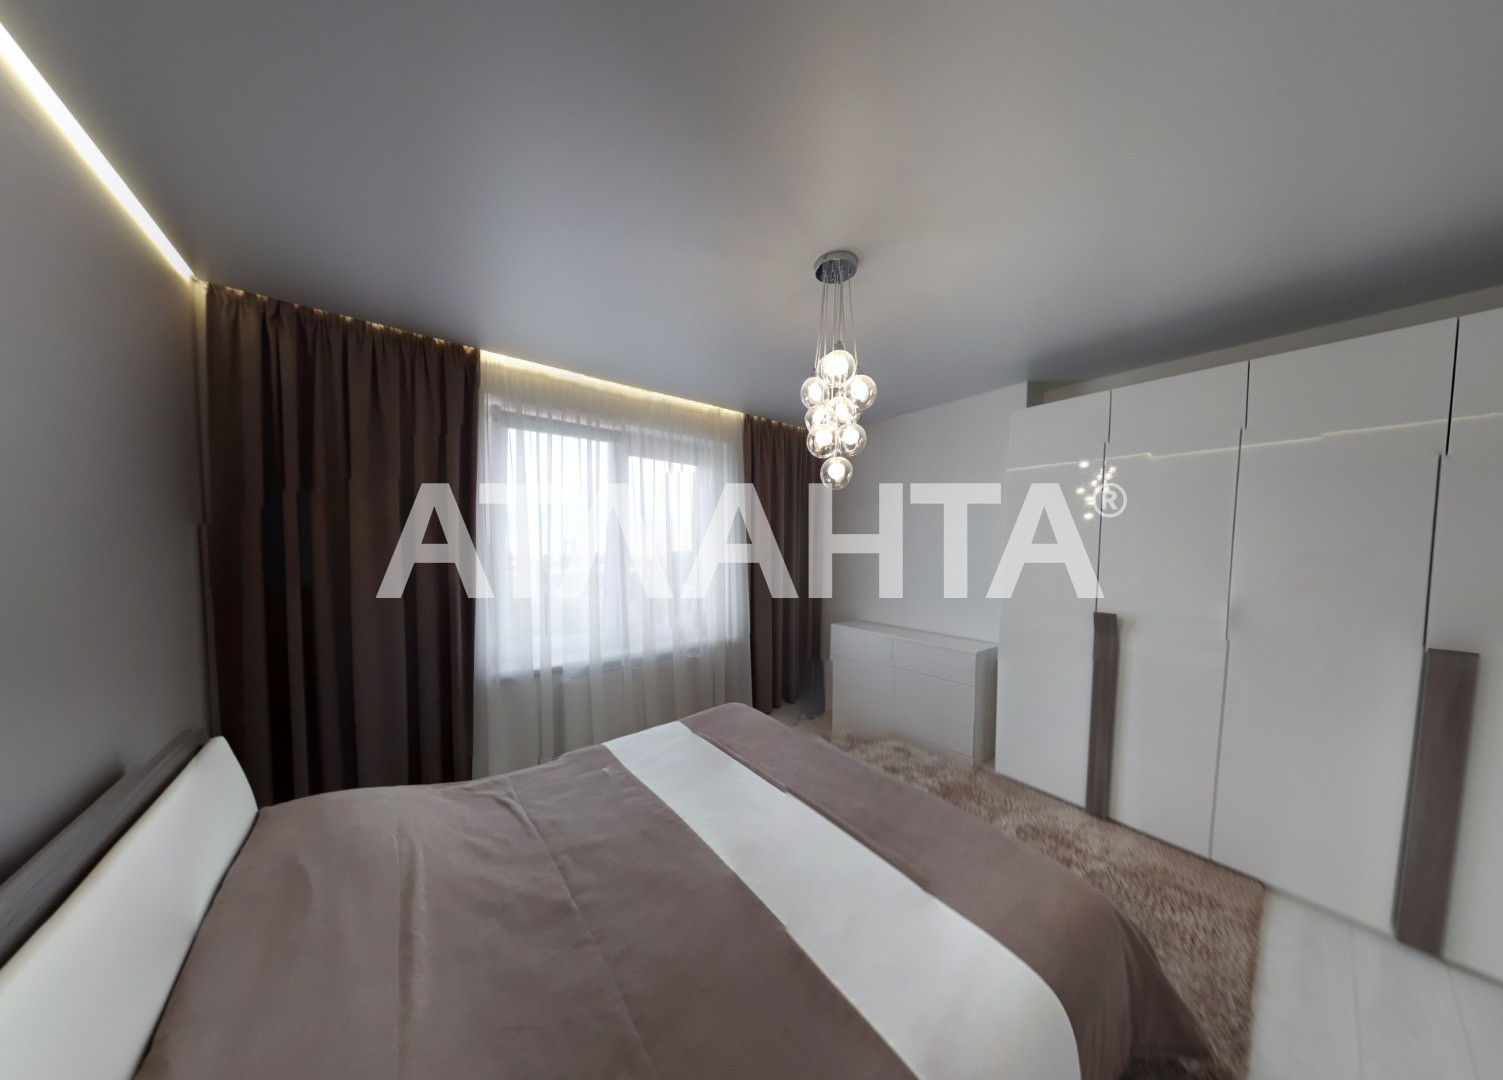 Продается 3-комнатная Квартира на ул. Просп. Глушкова — 160 000 у.е. (фото №21)